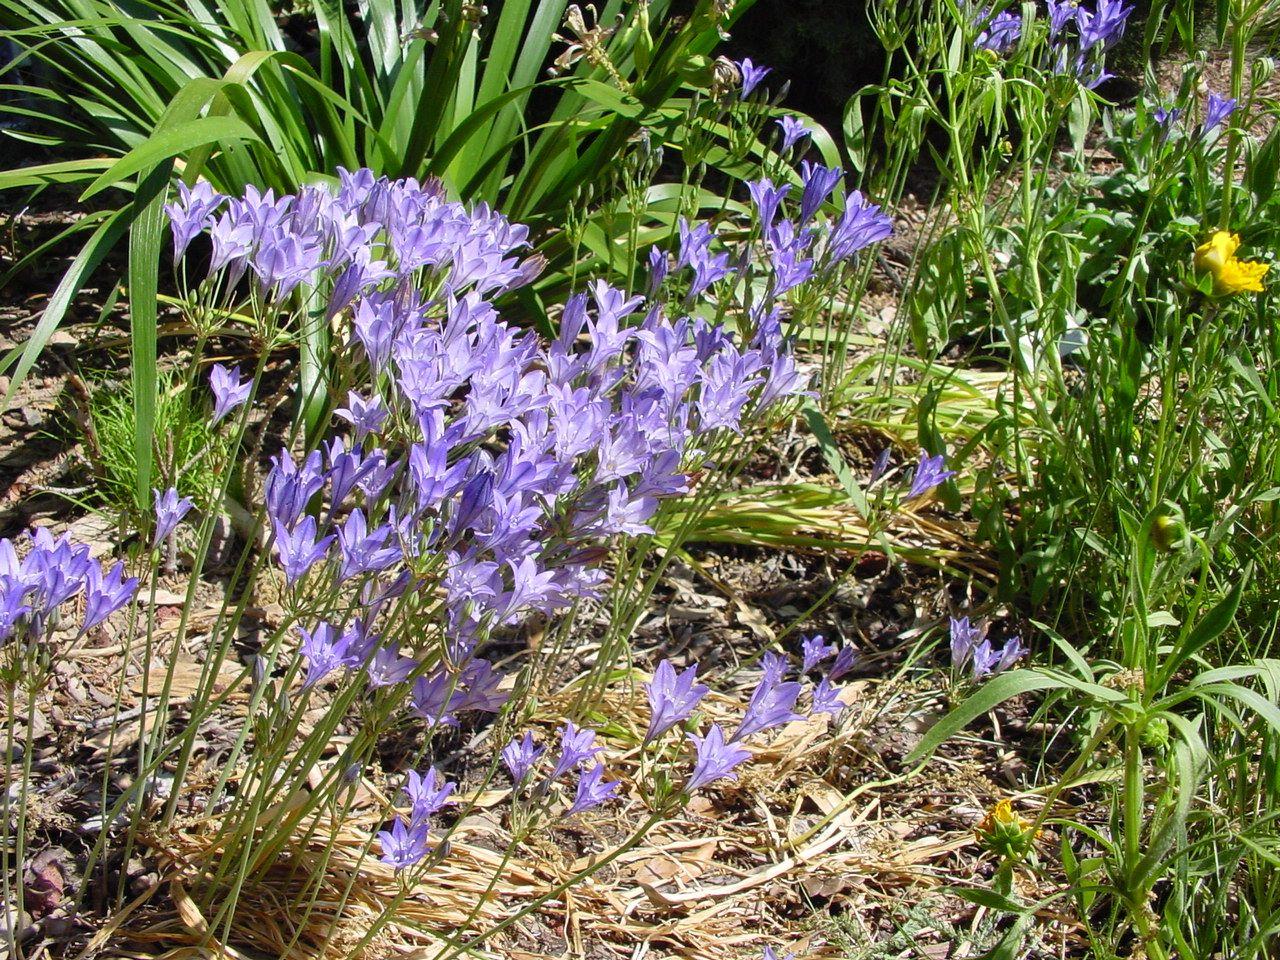 Garden Ideas Triteleia Laxa Native California Bulbs For Spring Dormant In Summer Returns Winter